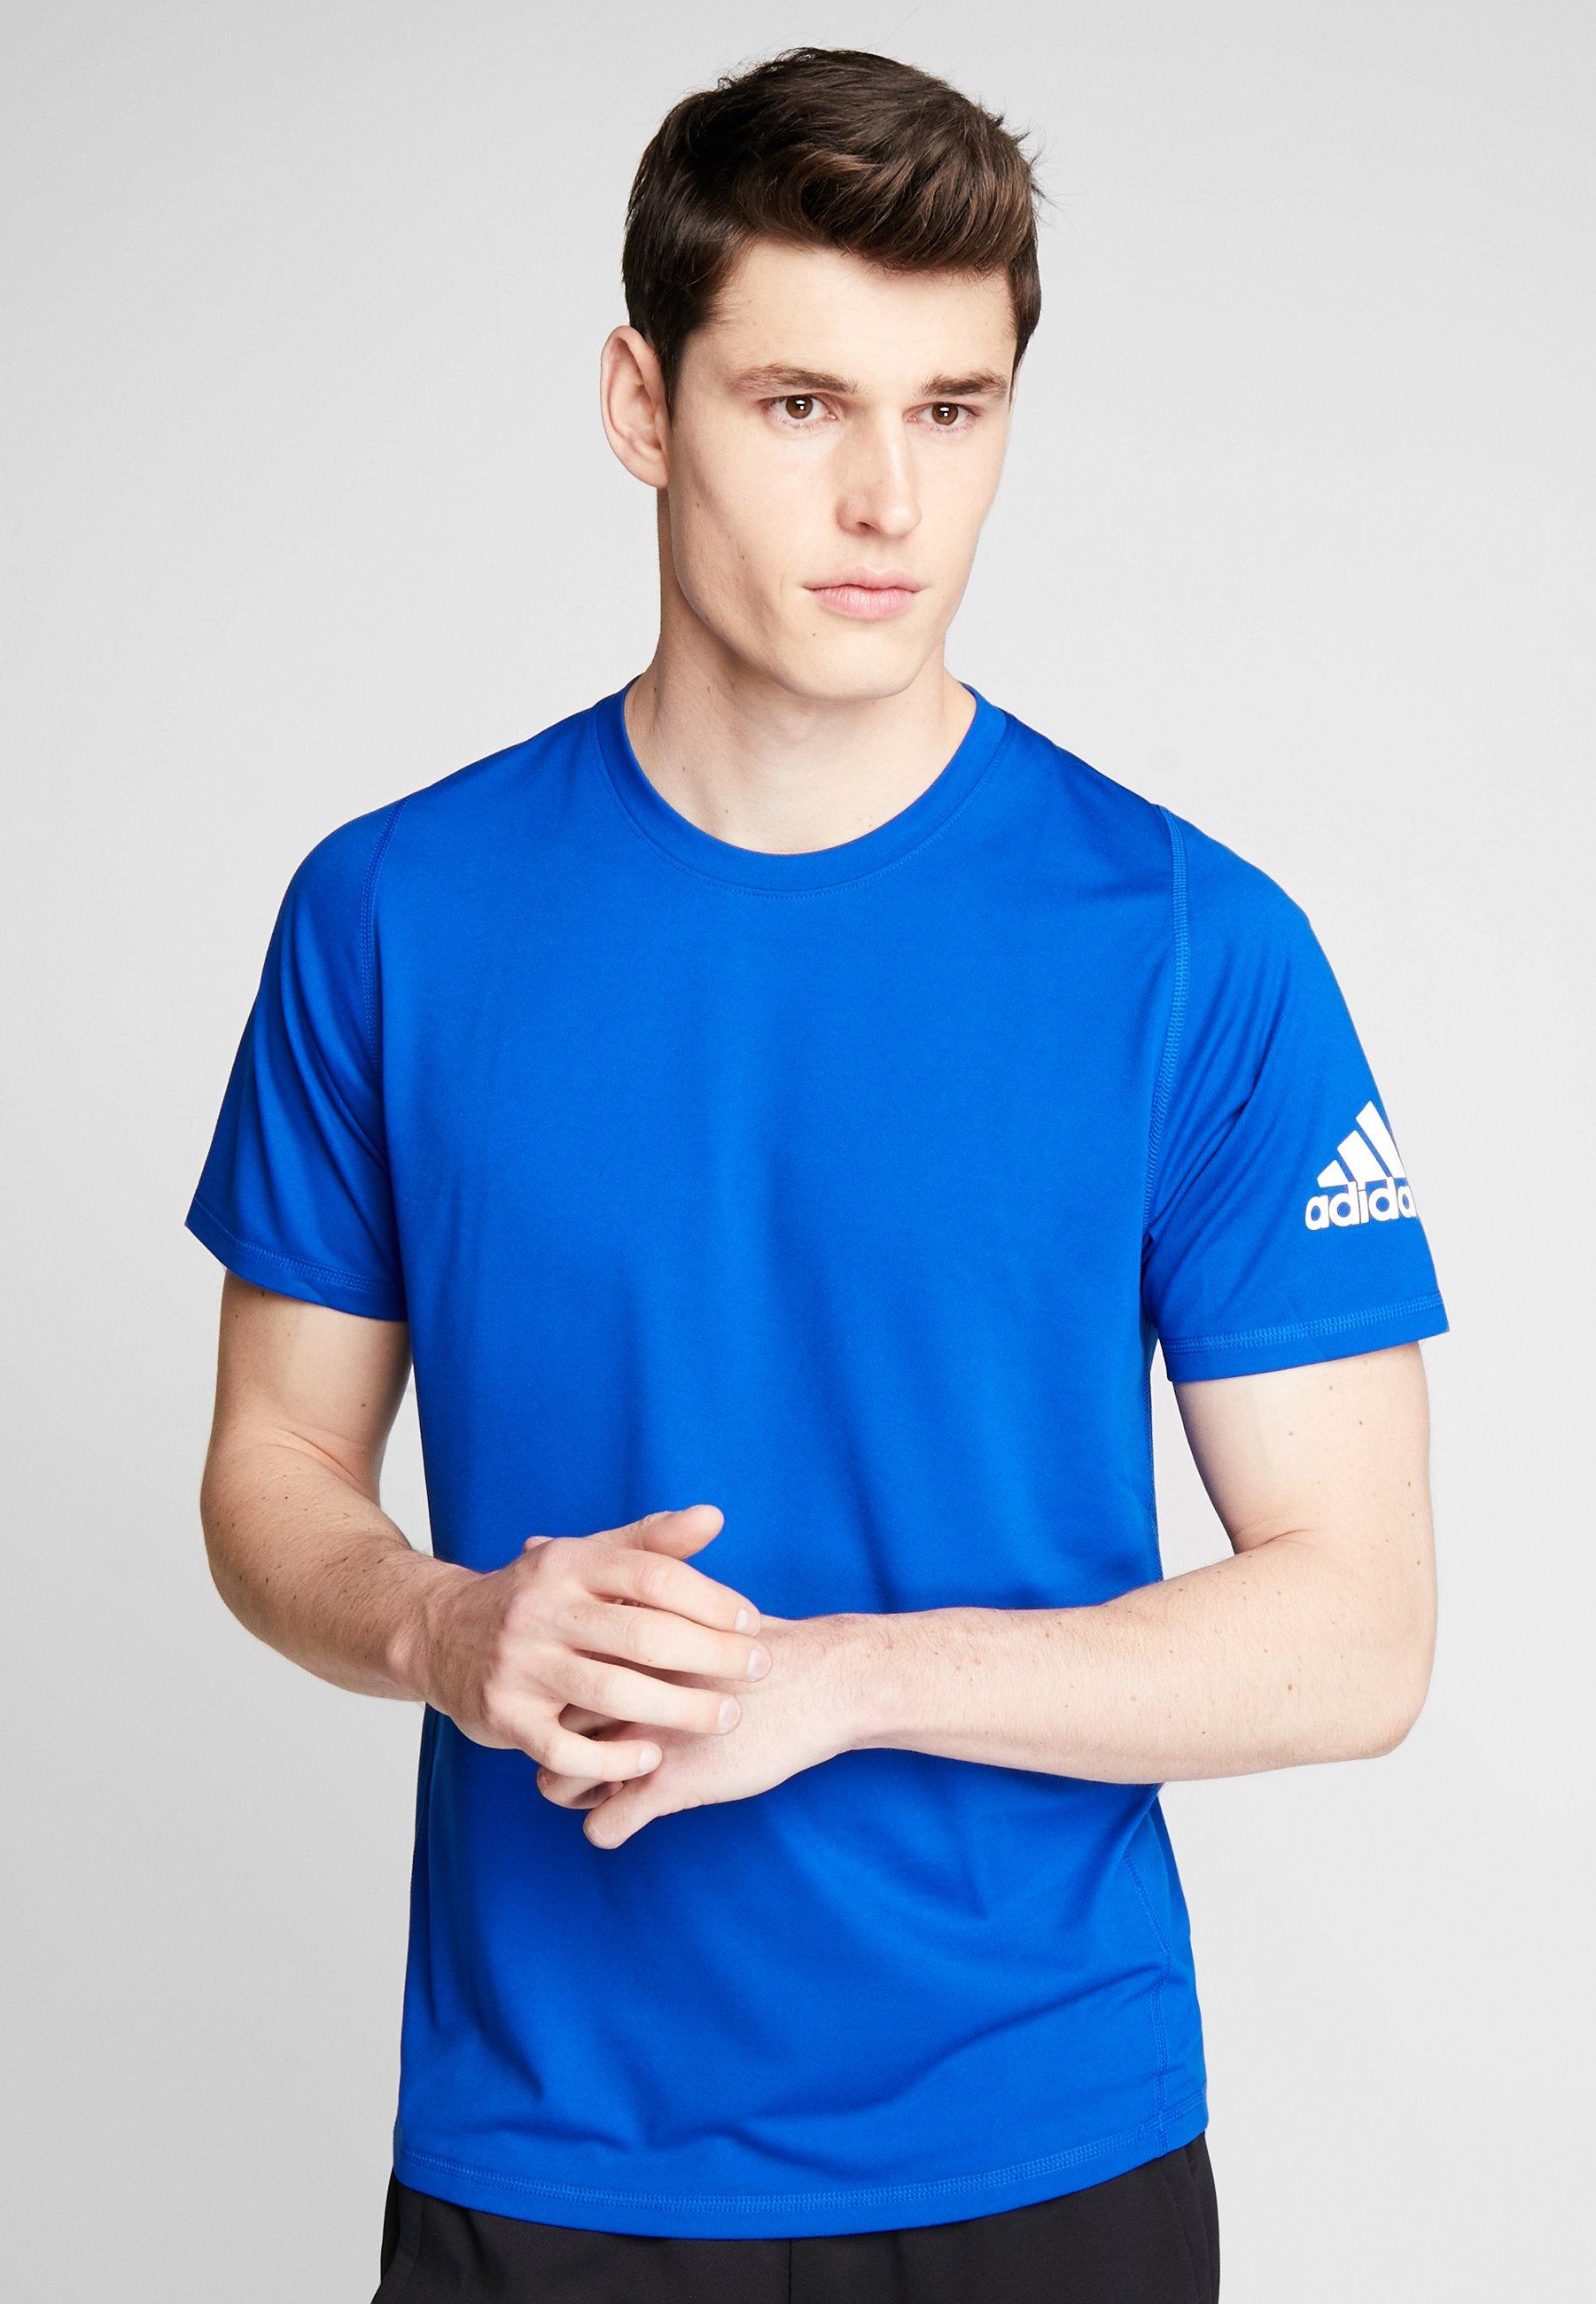 Adidas Royal white T ImpriméCyan shirt Performance zGqSpUMV